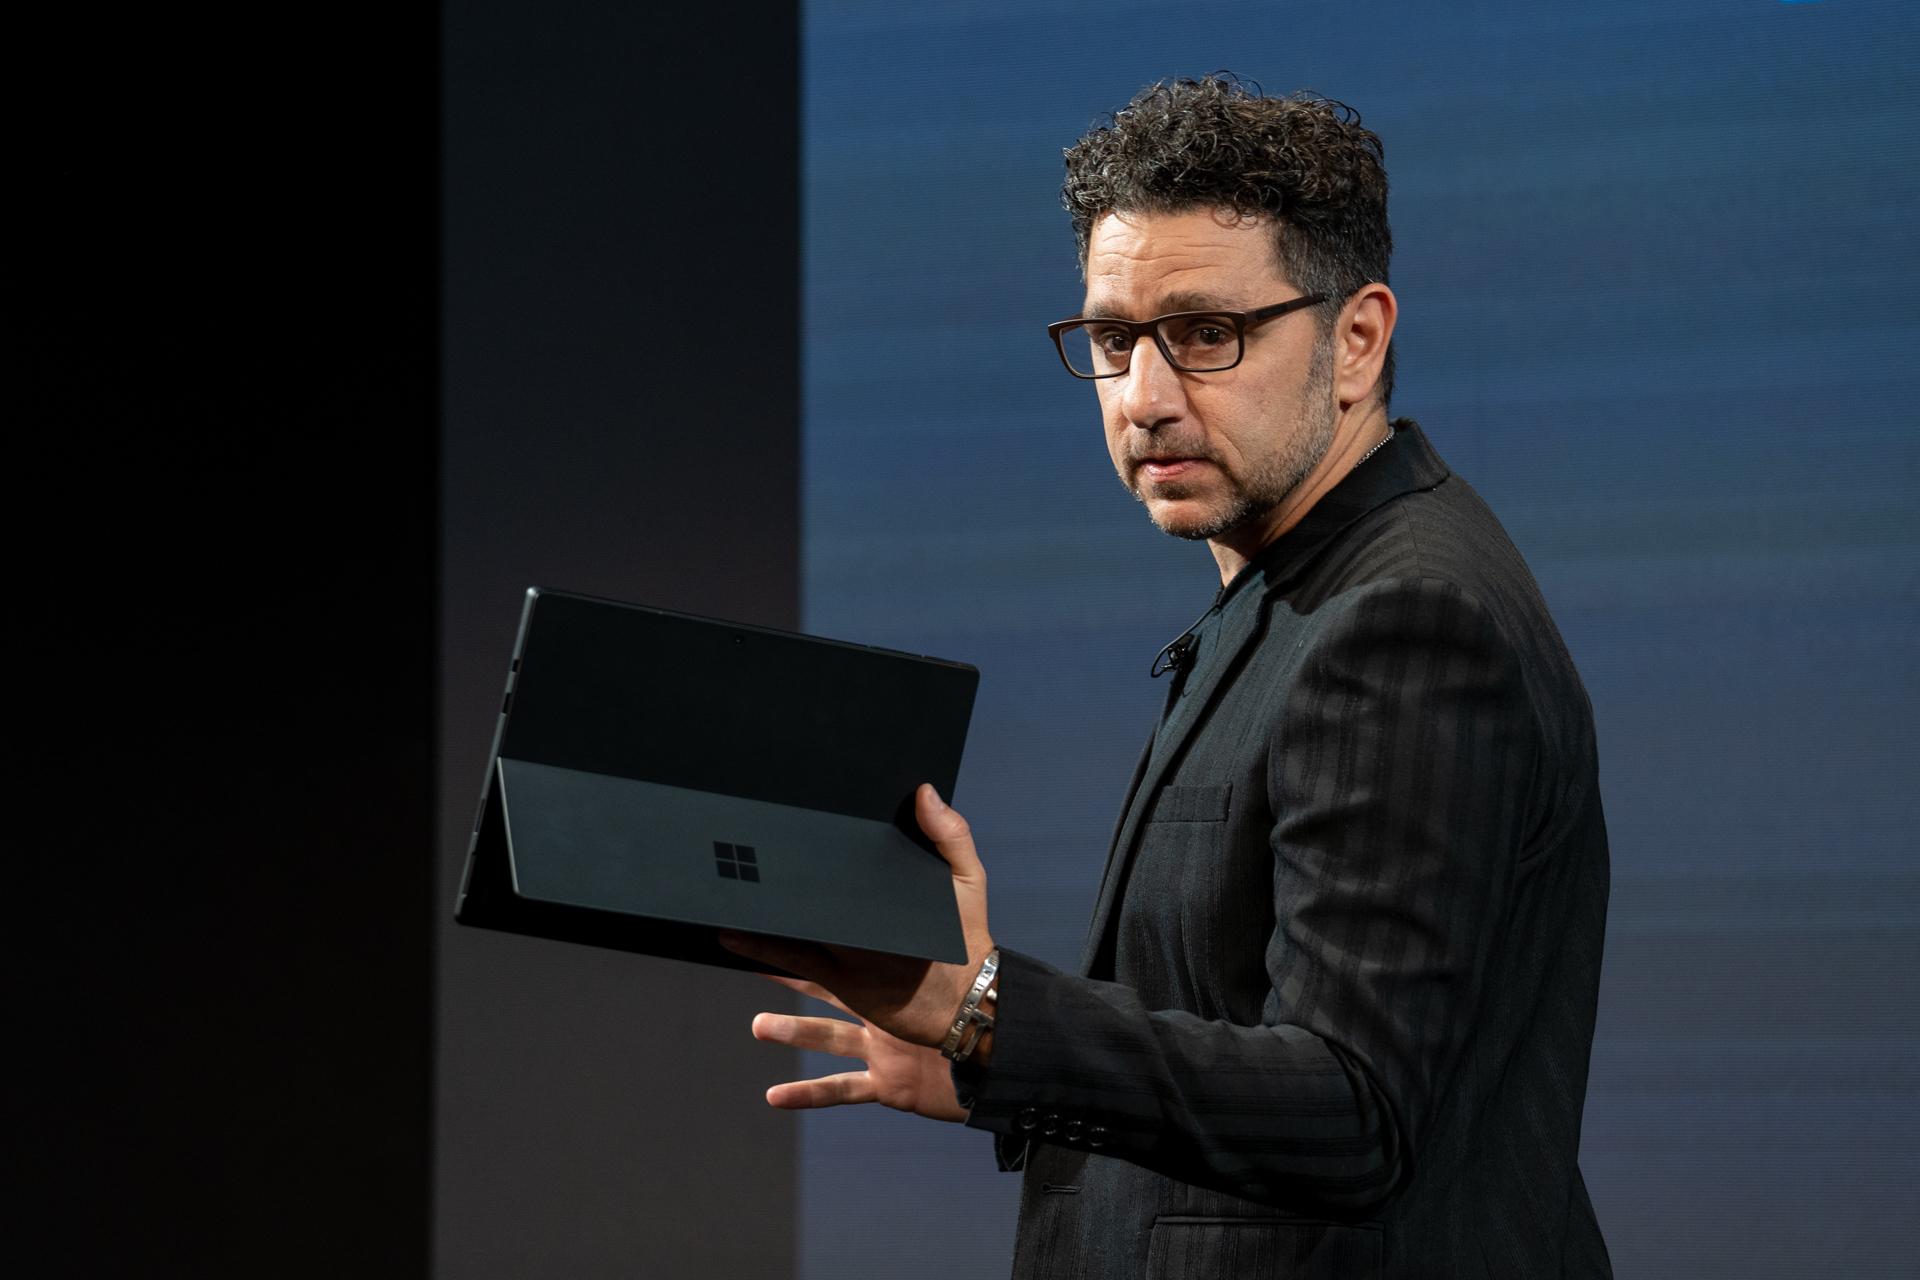 Microsoft'un Ürün Sorumlusu Panos Panay